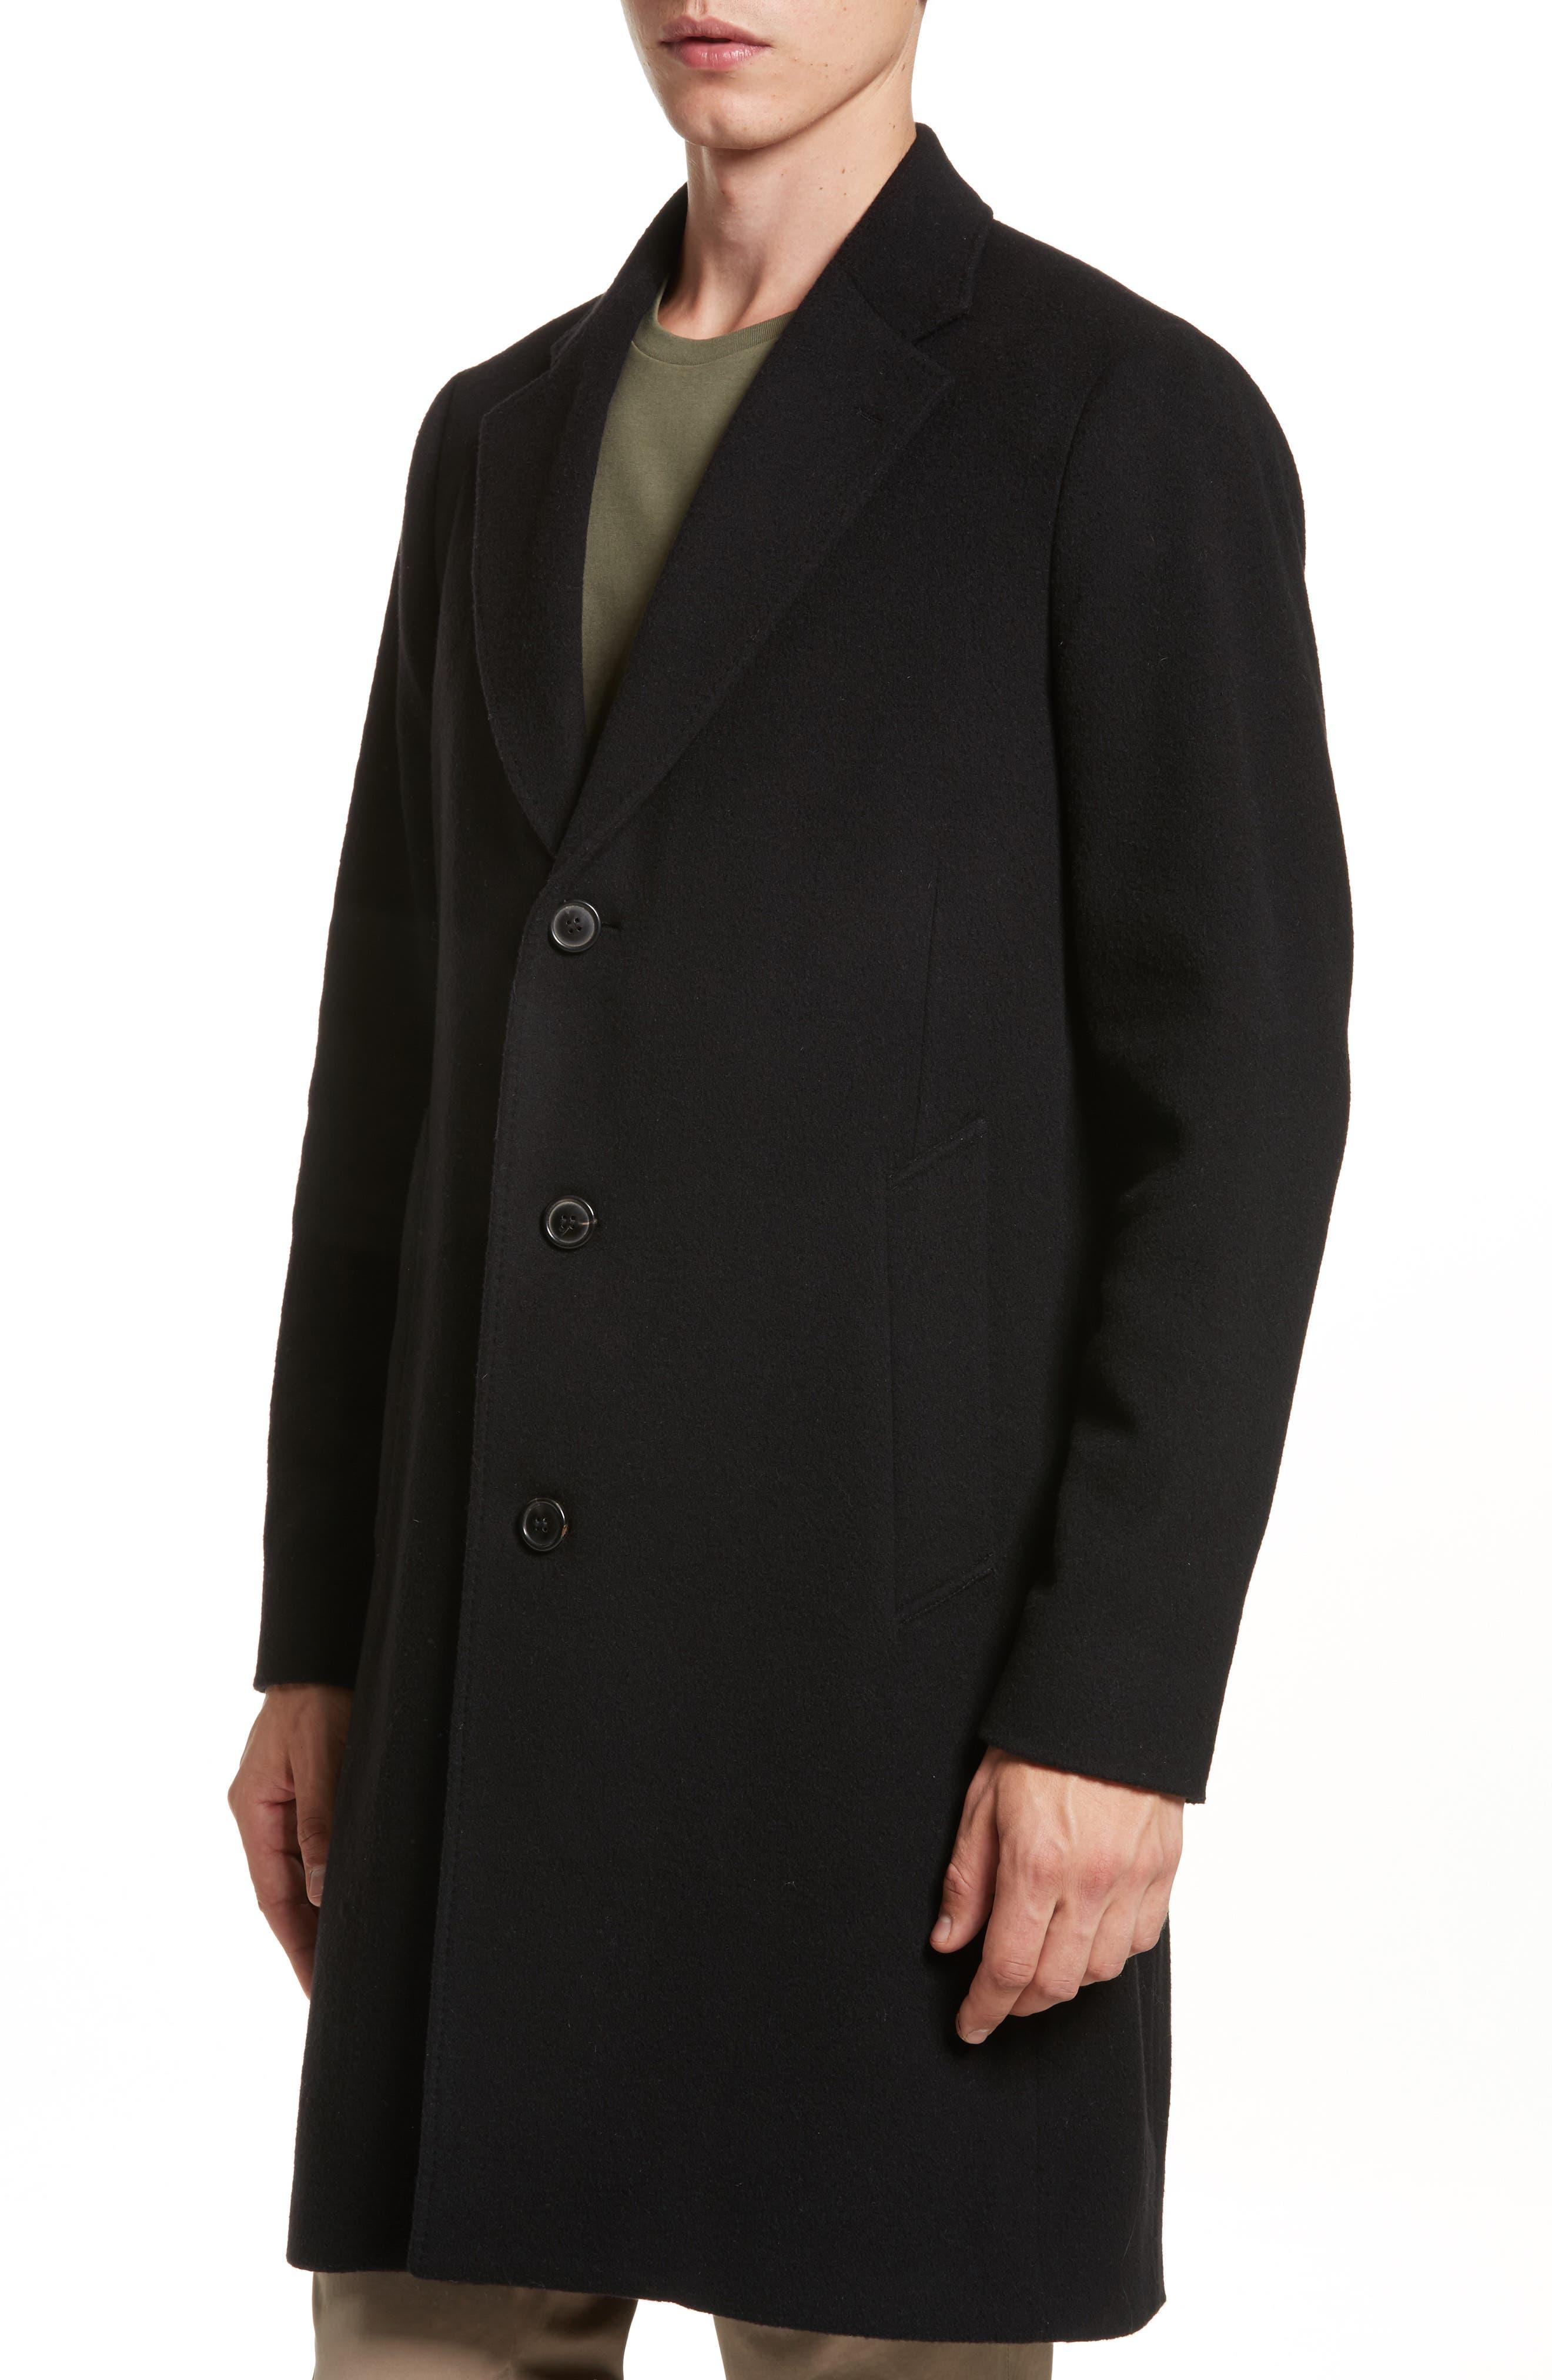 Wool & Cashmere Car Coat,                             Alternate thumbnail 4, color,                             001